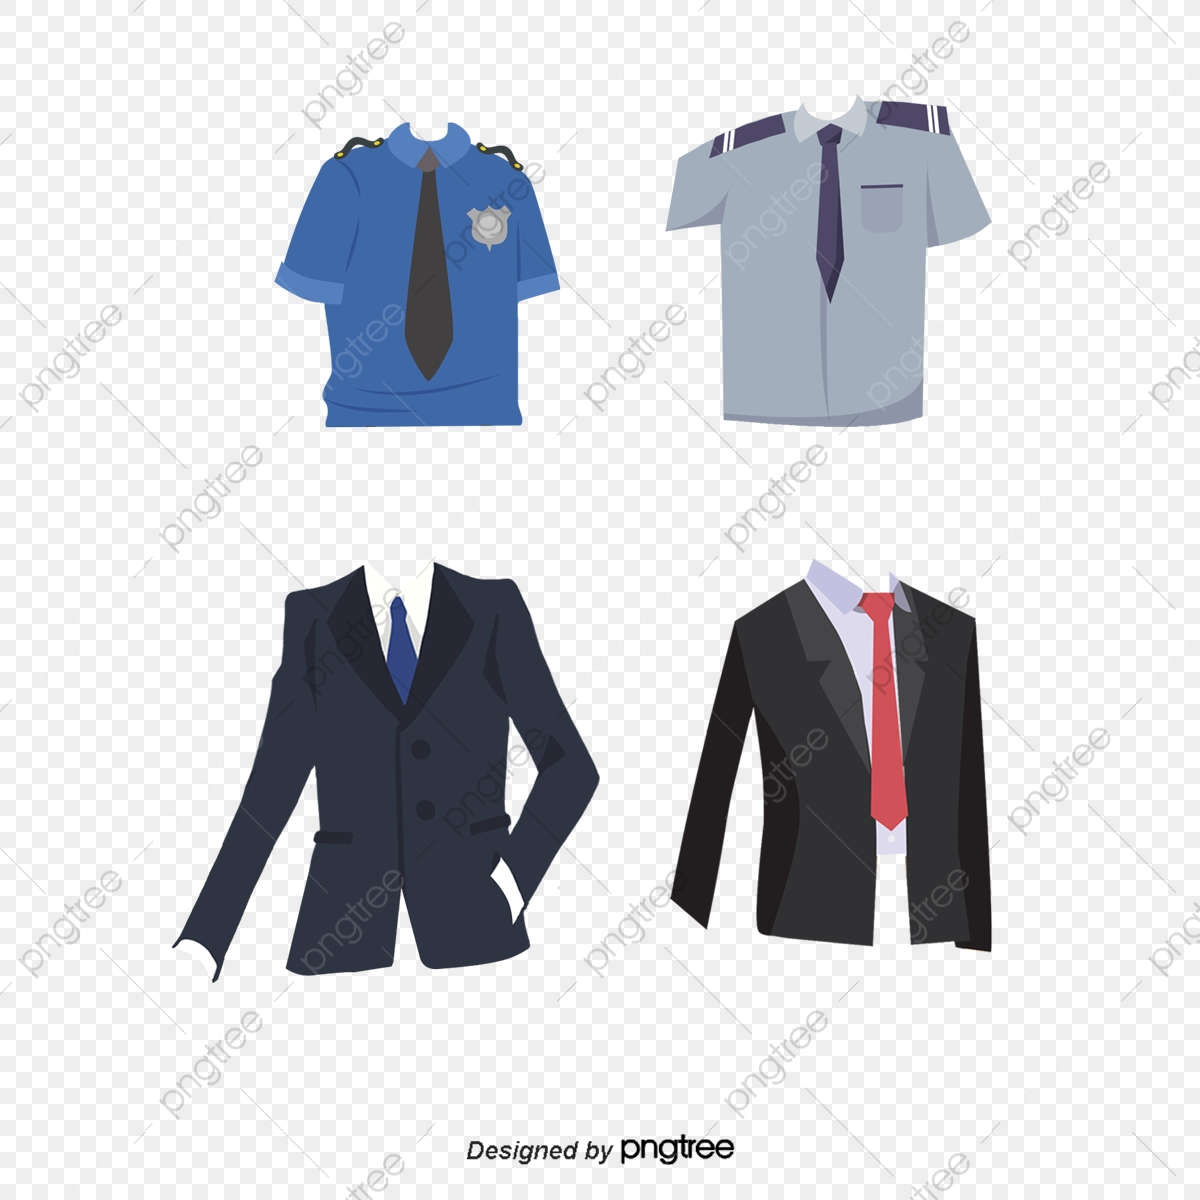 Various Clothing Uniform Passport, Passport Clipart, Military.